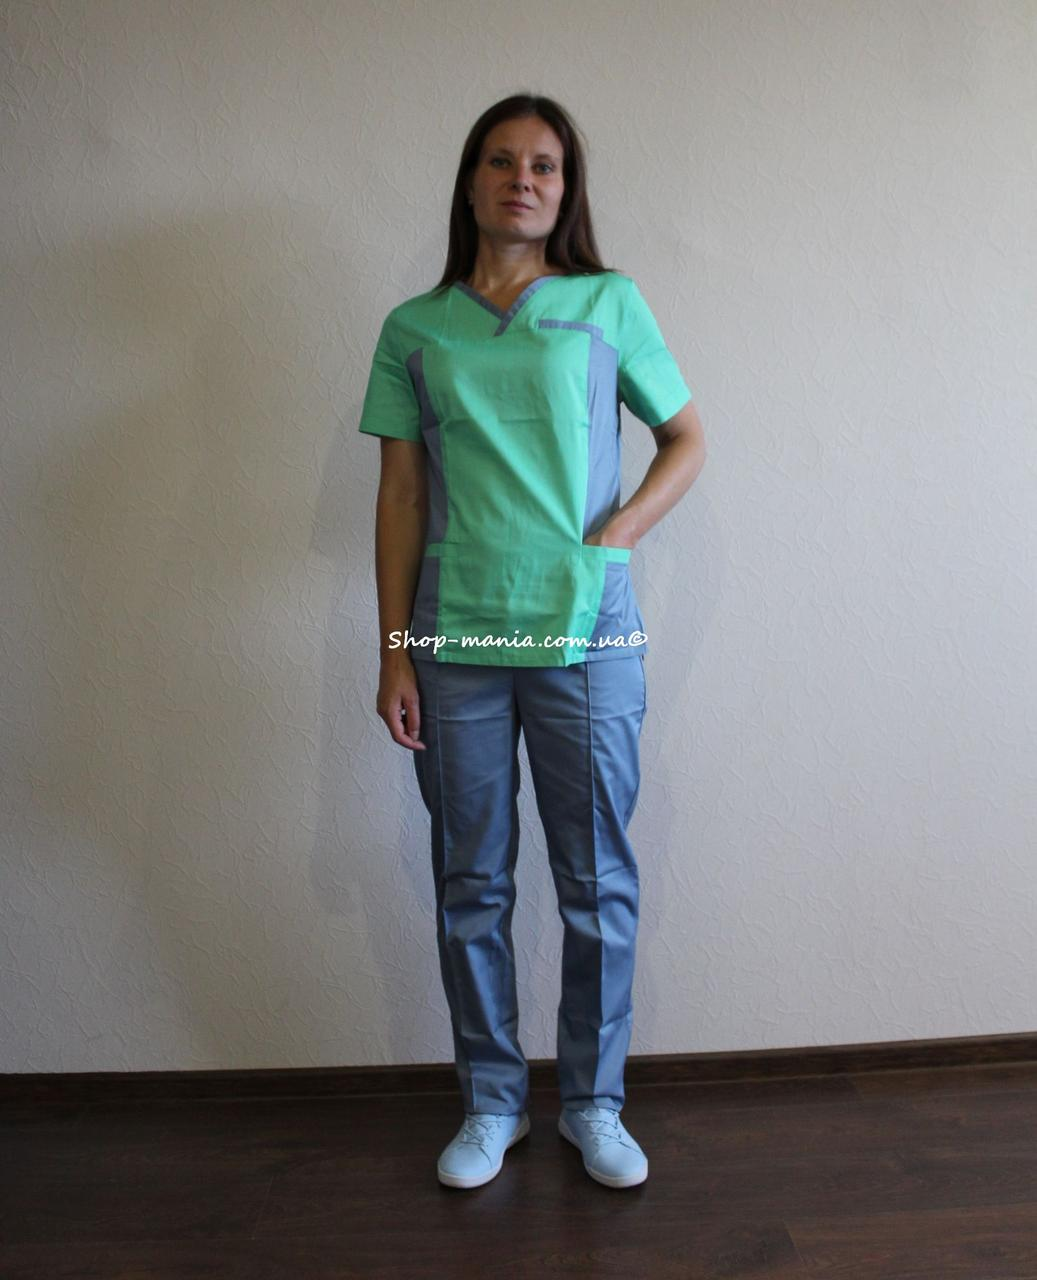 Хирургический медицинский женский костюм SM 1400-10 коттон Lilija 42-56 р (трава-серый)